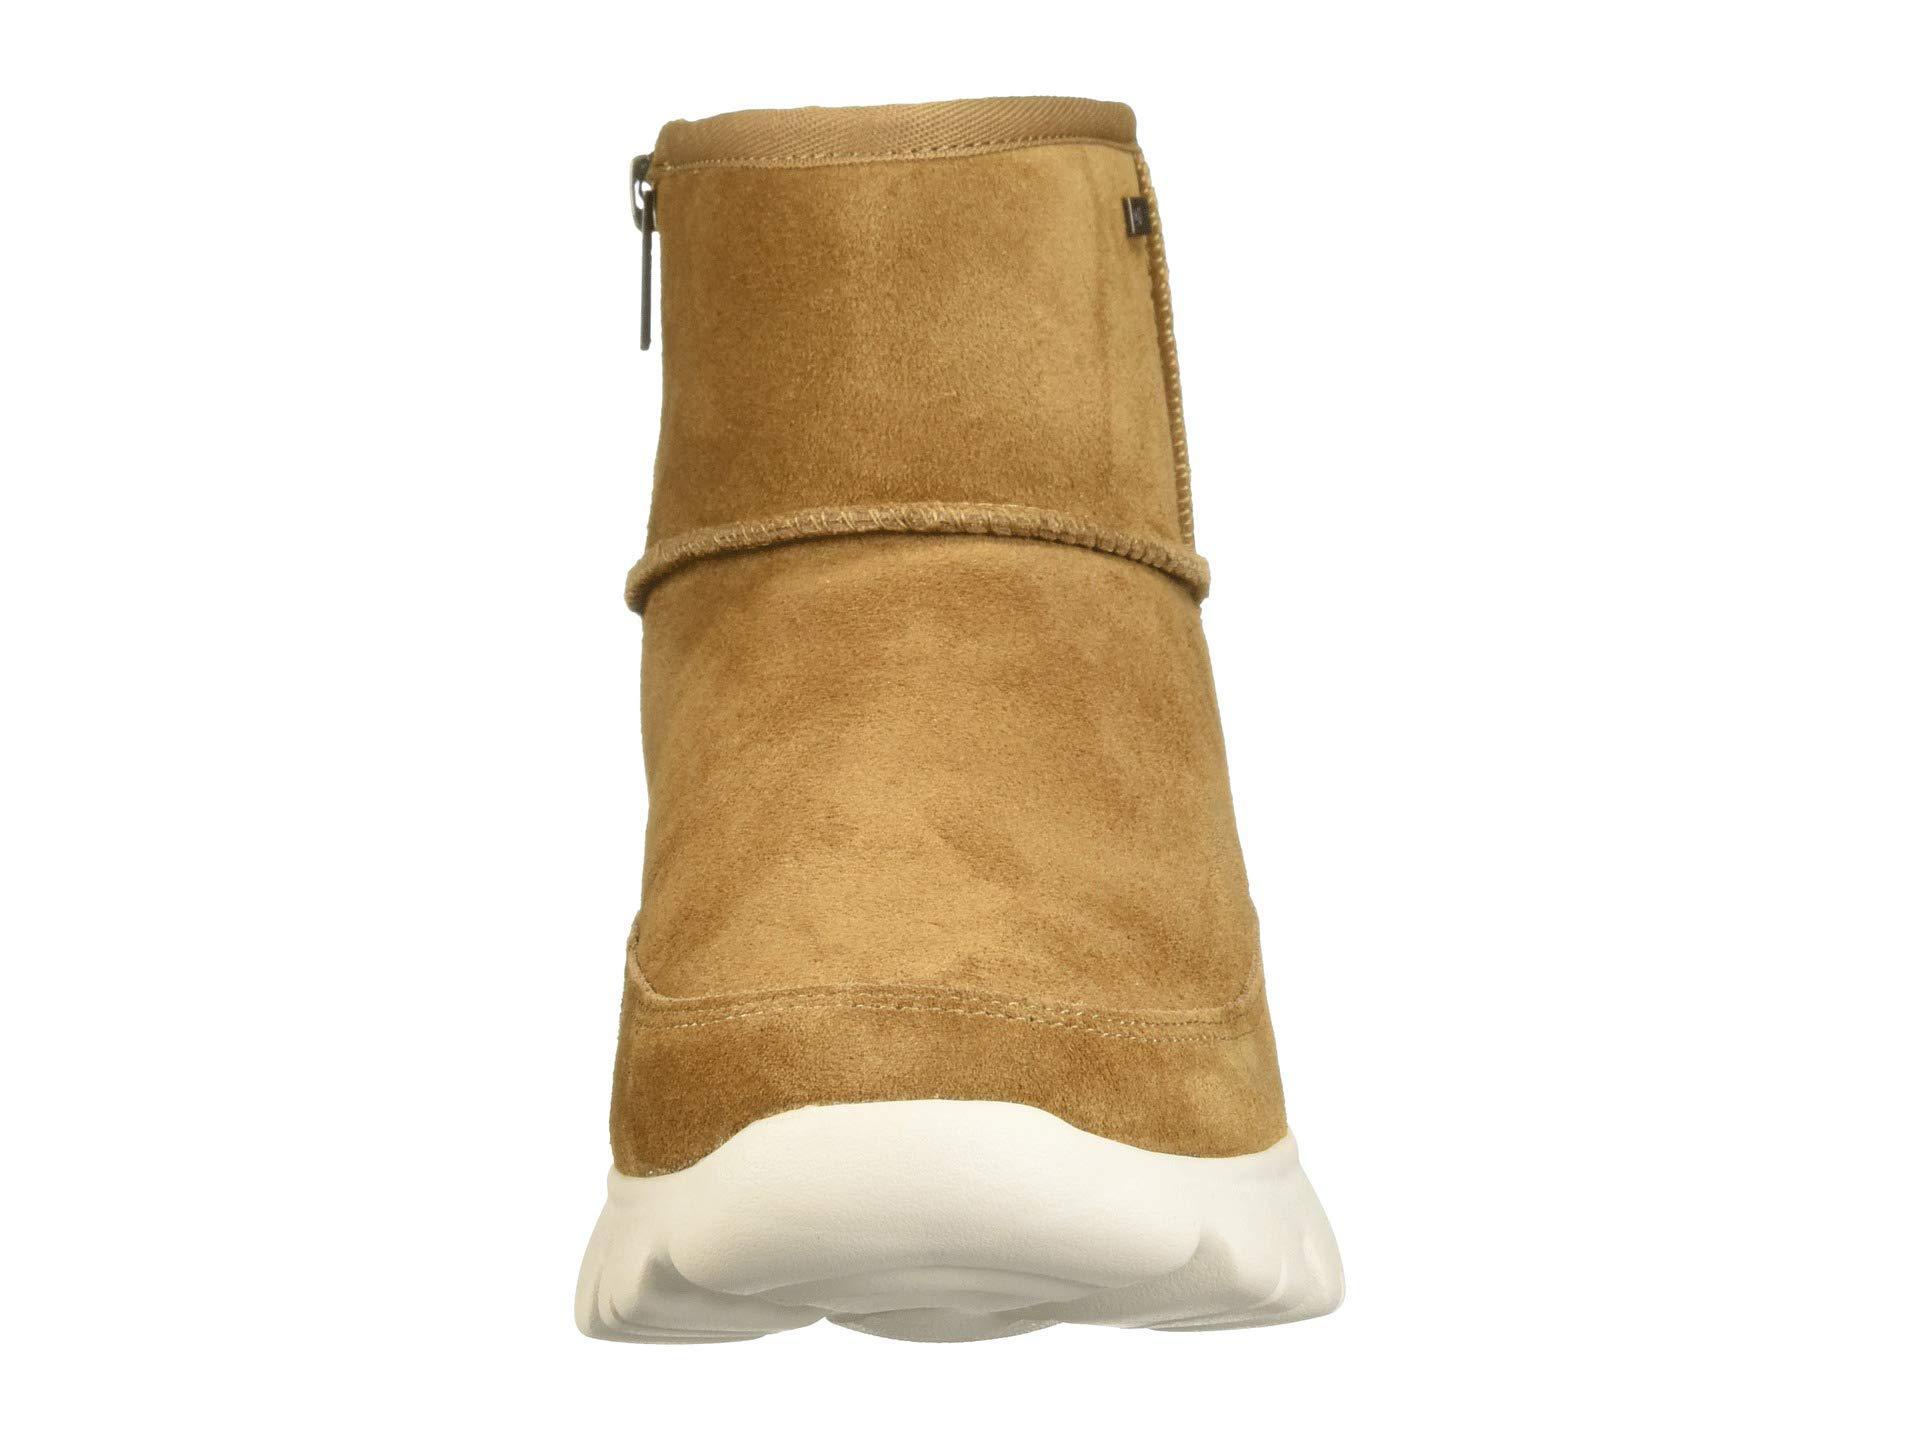 5dc852a8c41 Lyst - UGG Palomar Sneaker (black/charcoal) Women's Slip On Shoes in ...